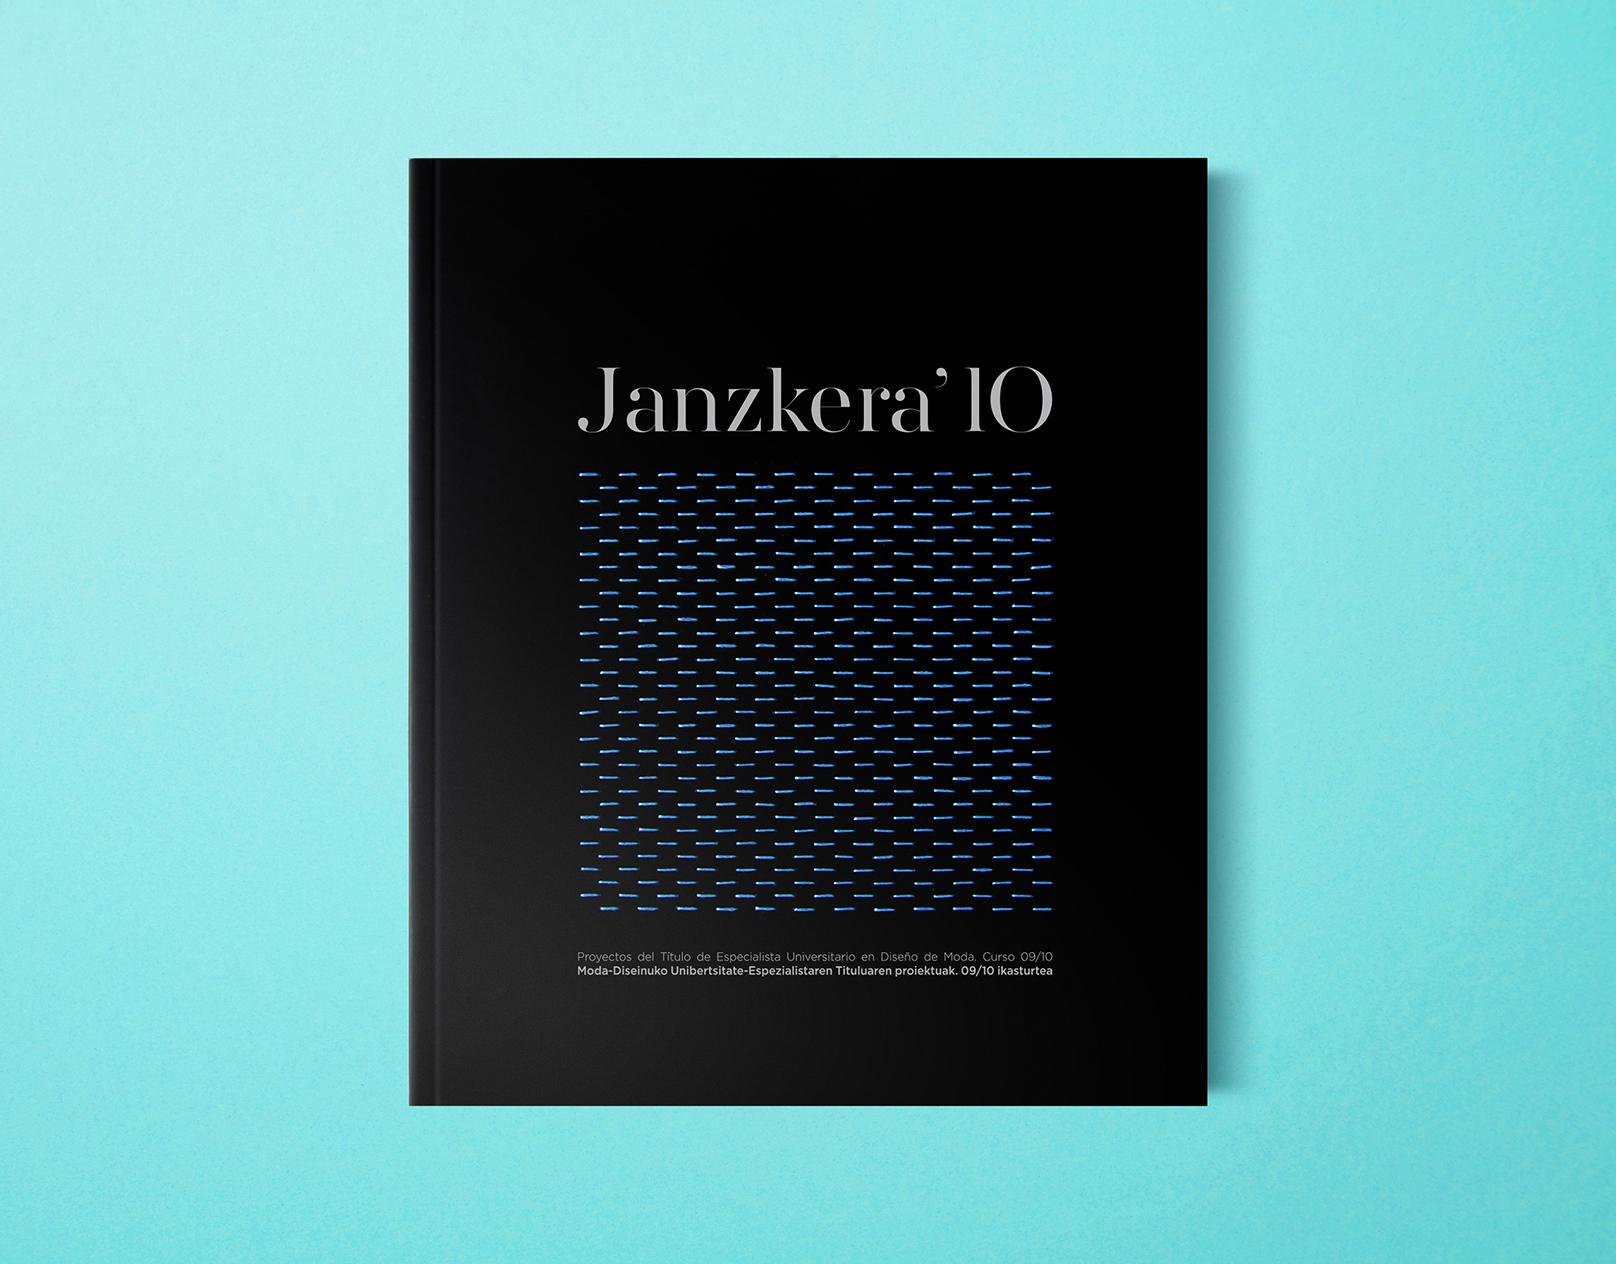 Janzkera 10